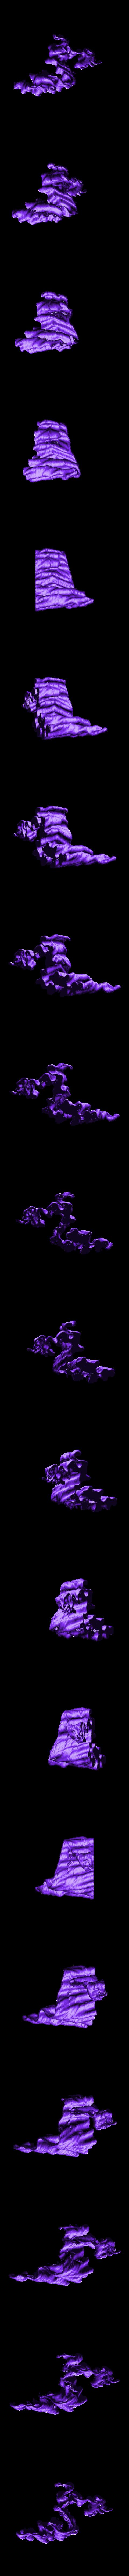 gro5.stl Download free STL file Weird terrain collection • 3D printer object, ferjerez3d